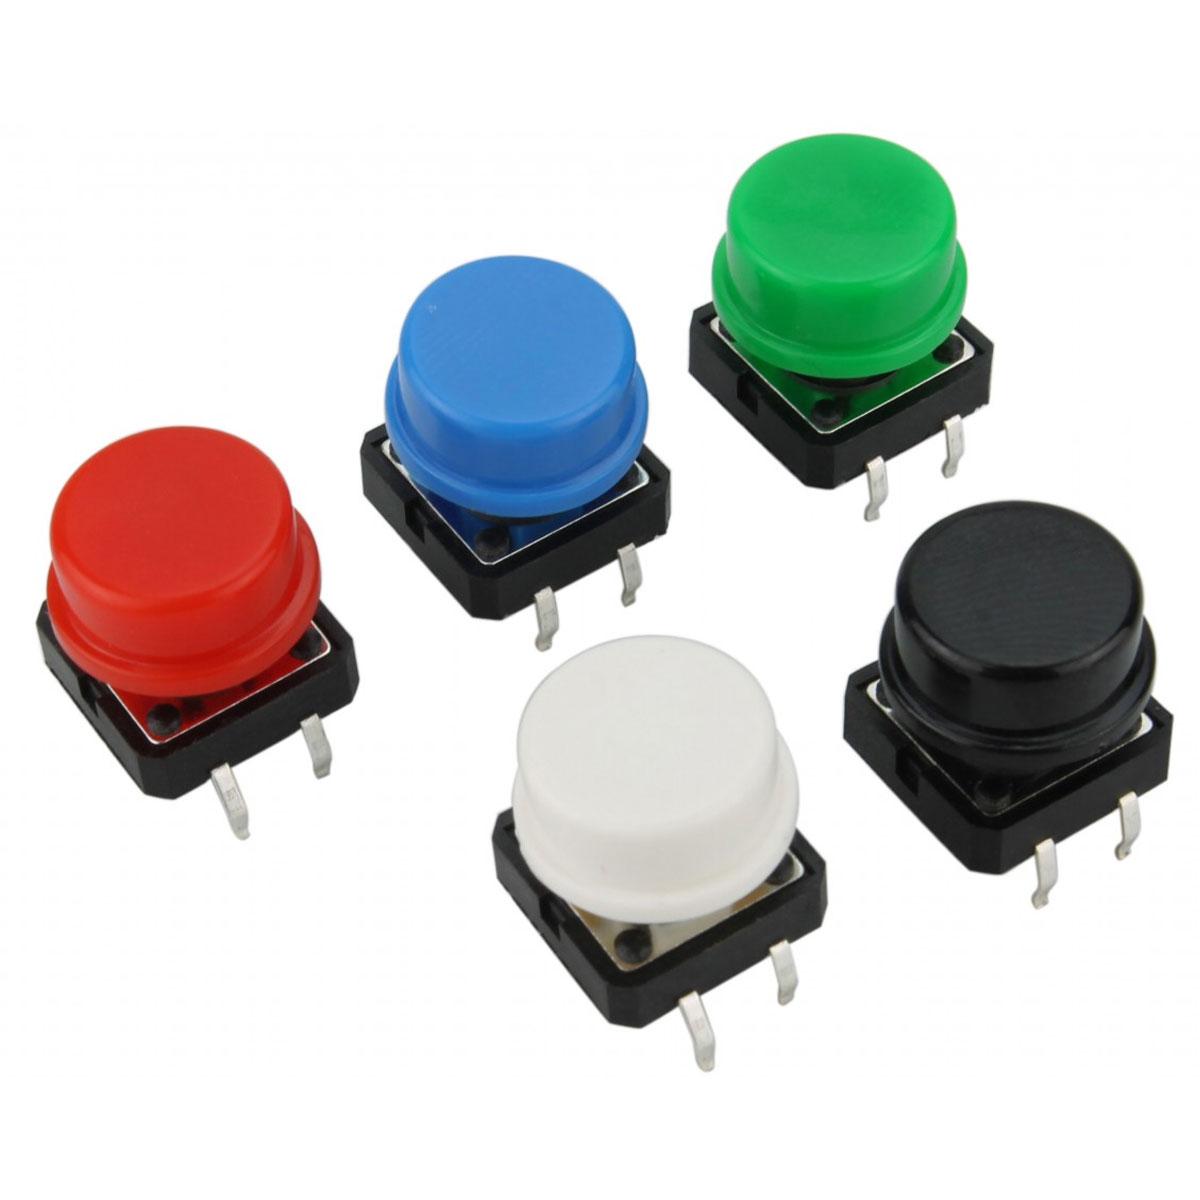 Kit Push Button 12x12 com Capas Coloridas 25 Unidades + Caixa